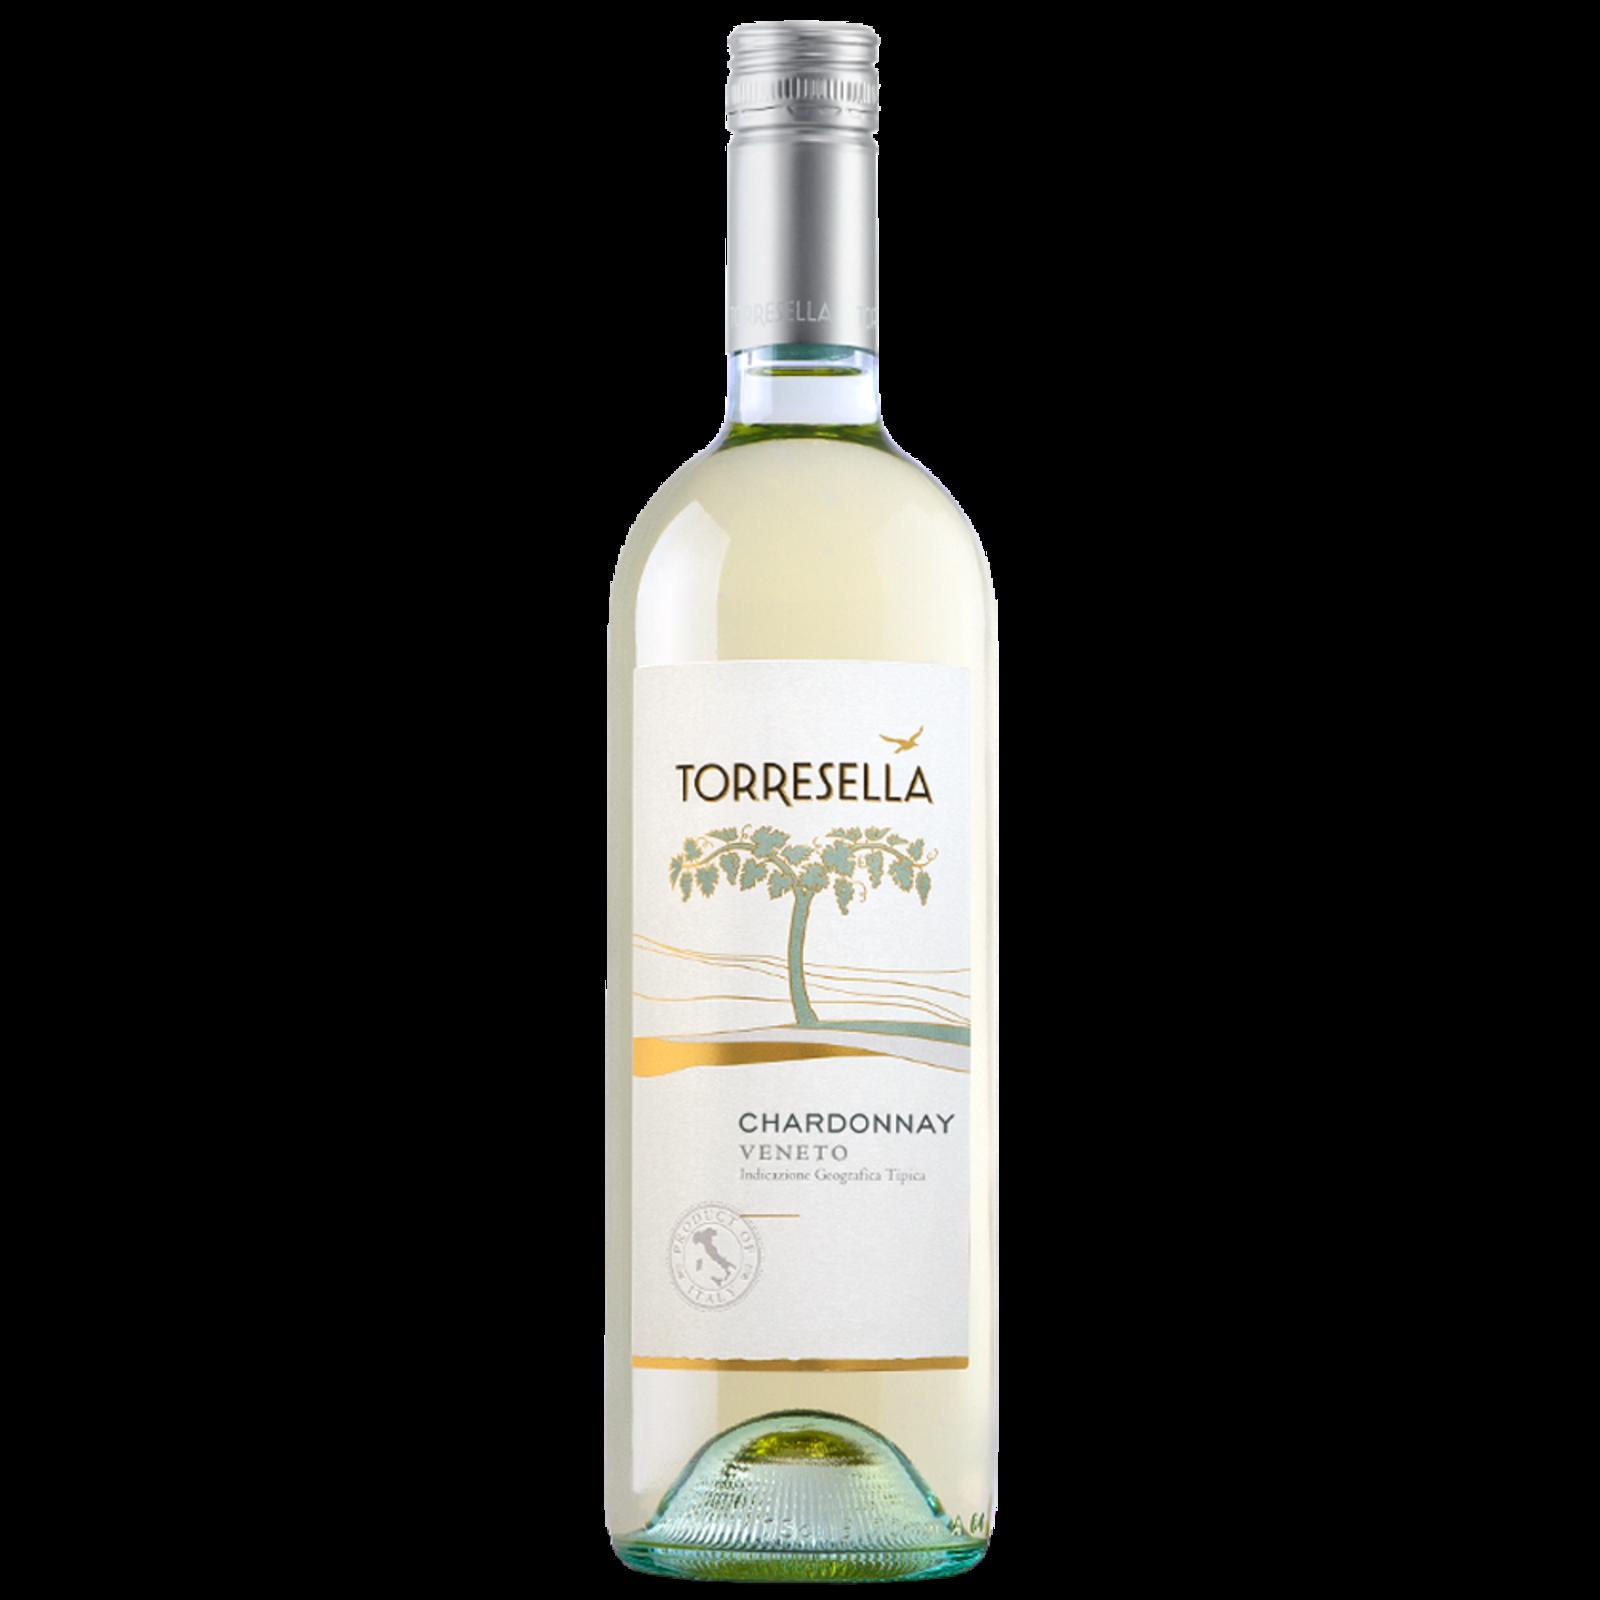 Cantine Torresella Torresella Chardonnay 2020